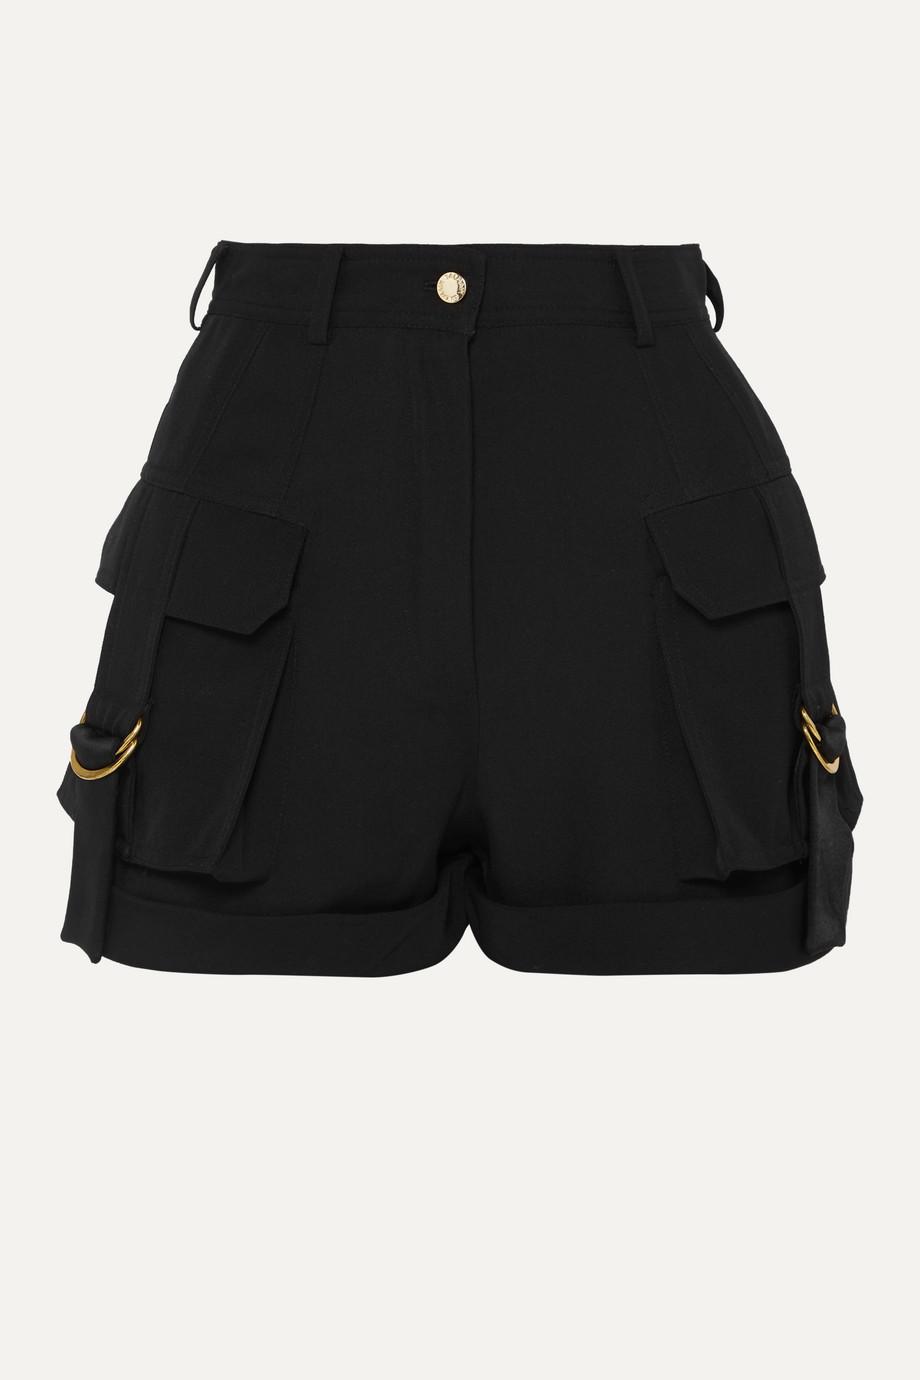 Balmain Grain de poudre wool shorts